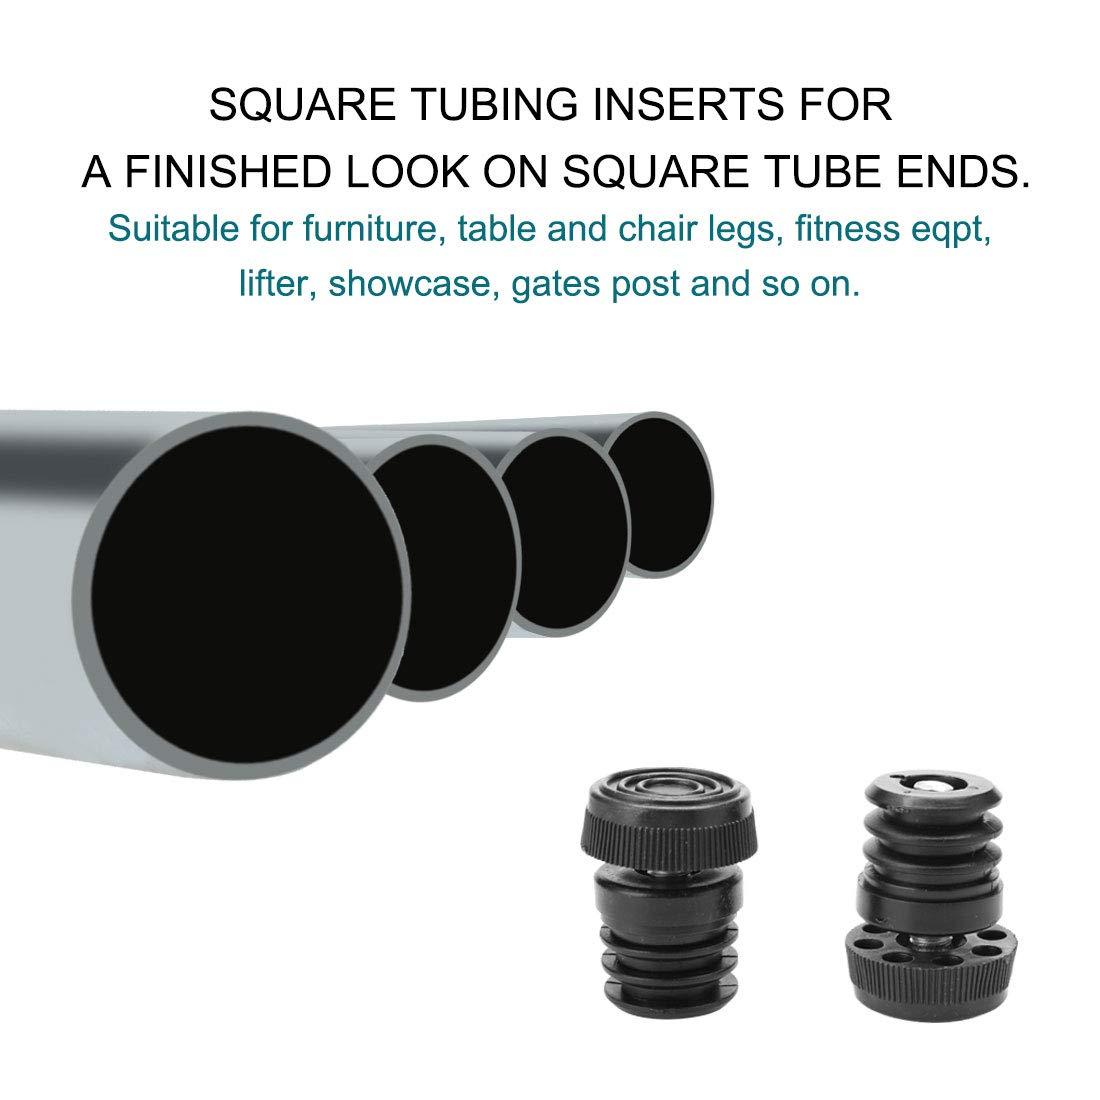 uxcell/® Leveling Feet 1 25mm OD Plastic Round Tube Inserts Kit Furniture Glide Adjustable Leveler for Sofa Leg 2 Sets